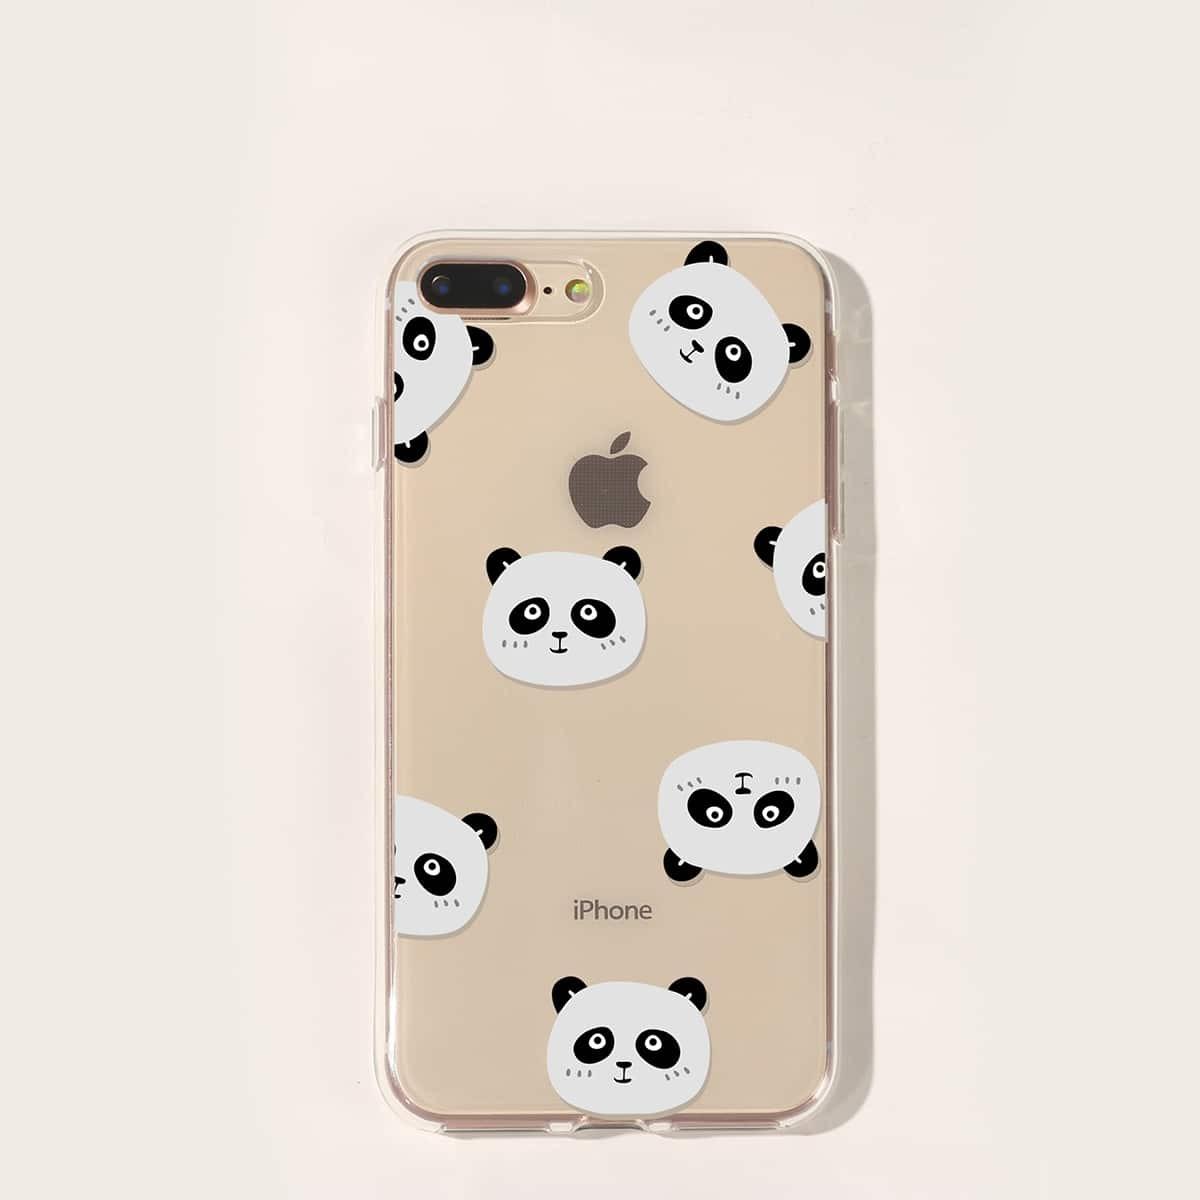 SHEIN / IPhone Hülle mit Panda Muster